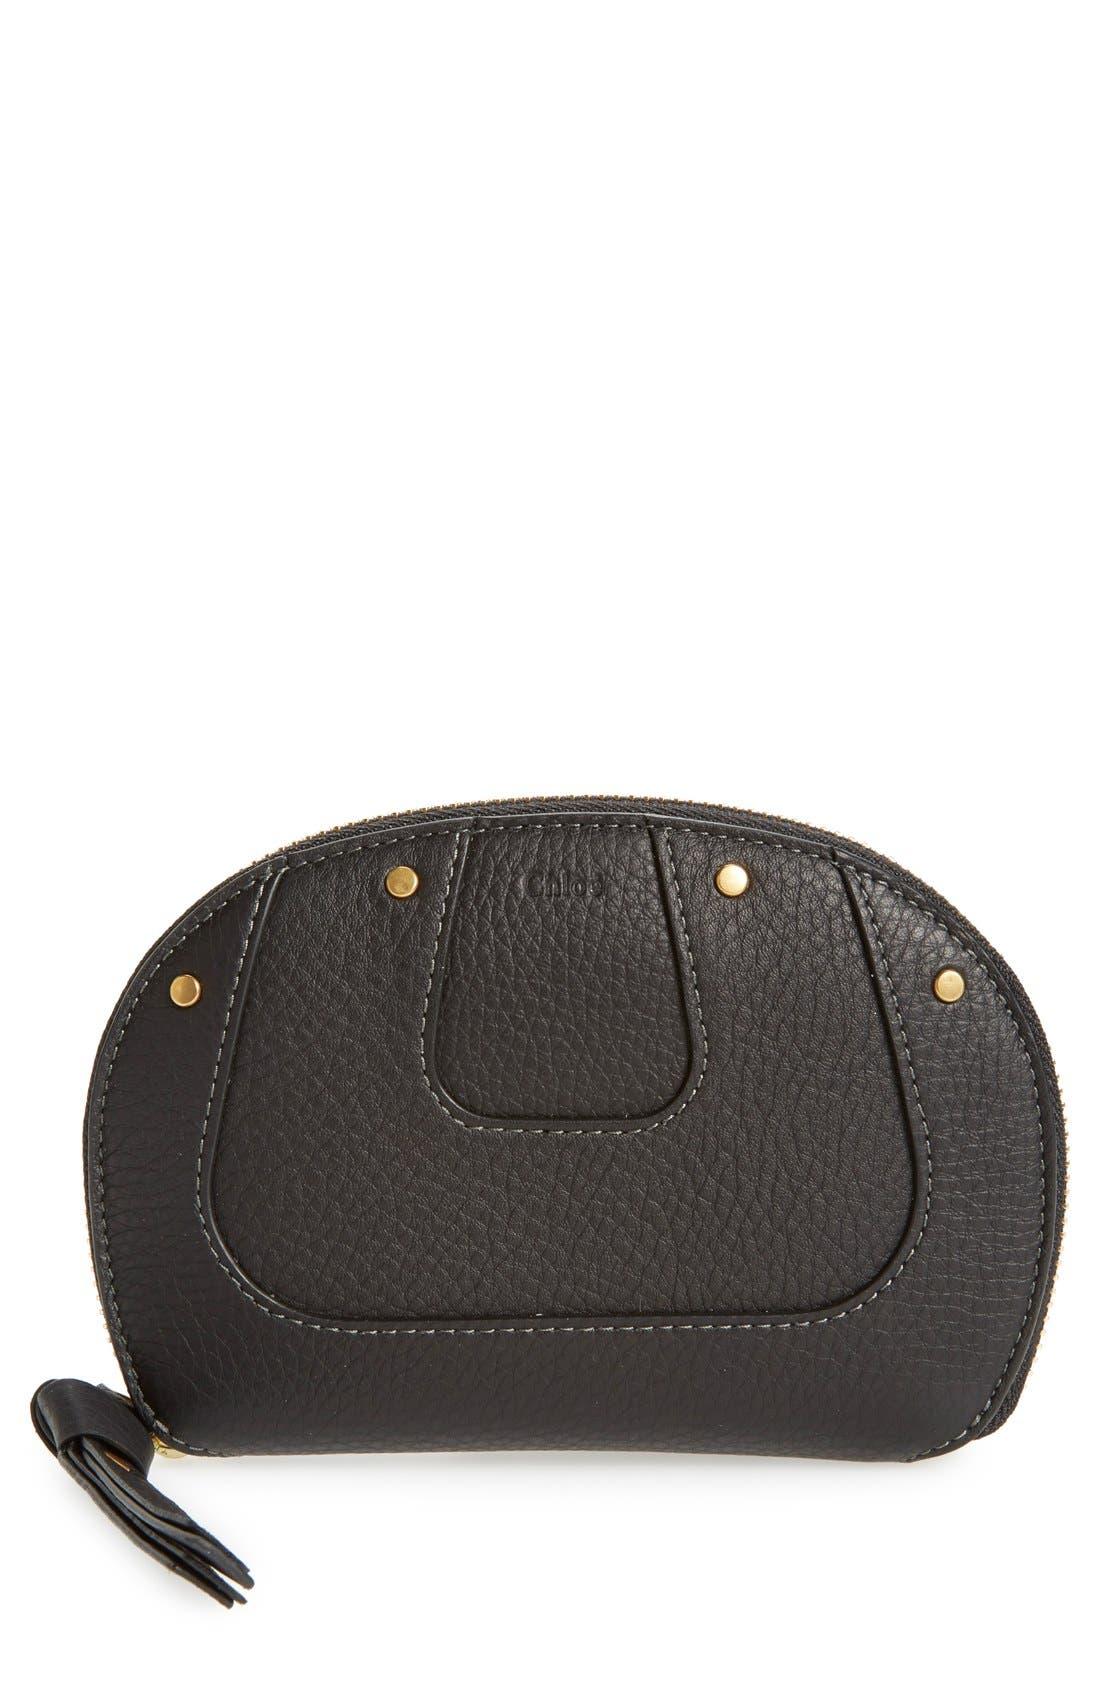 CHLOÉ 'Hayley' Zip Around Calfskin Leather Wallet, Main, color, 001